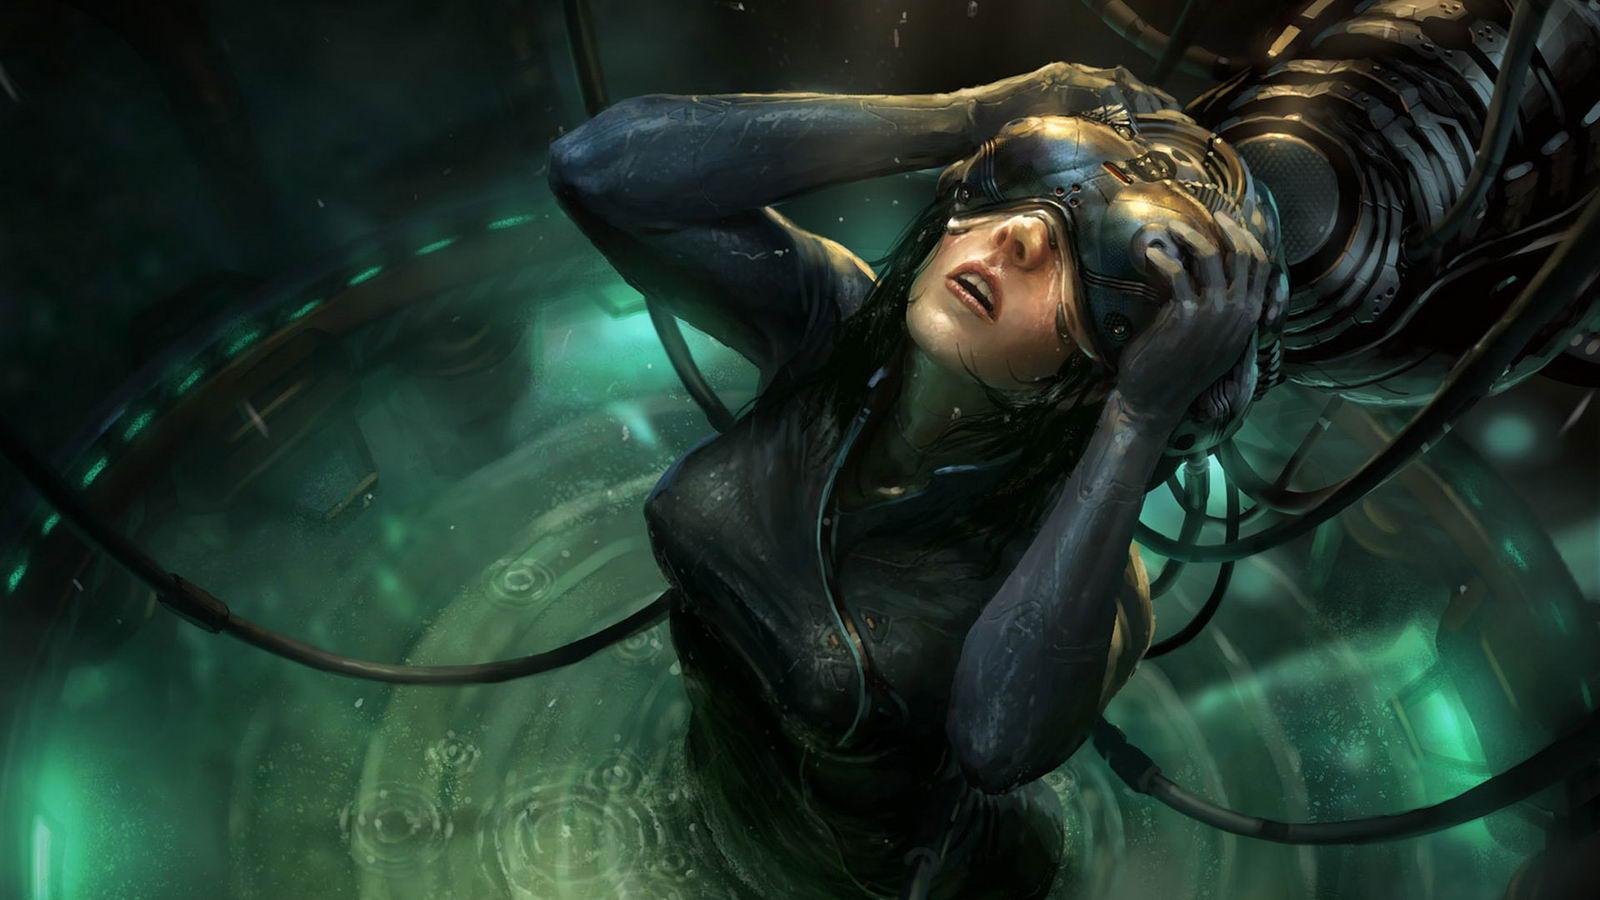 Картинки по запросу Cyberpunk 2077